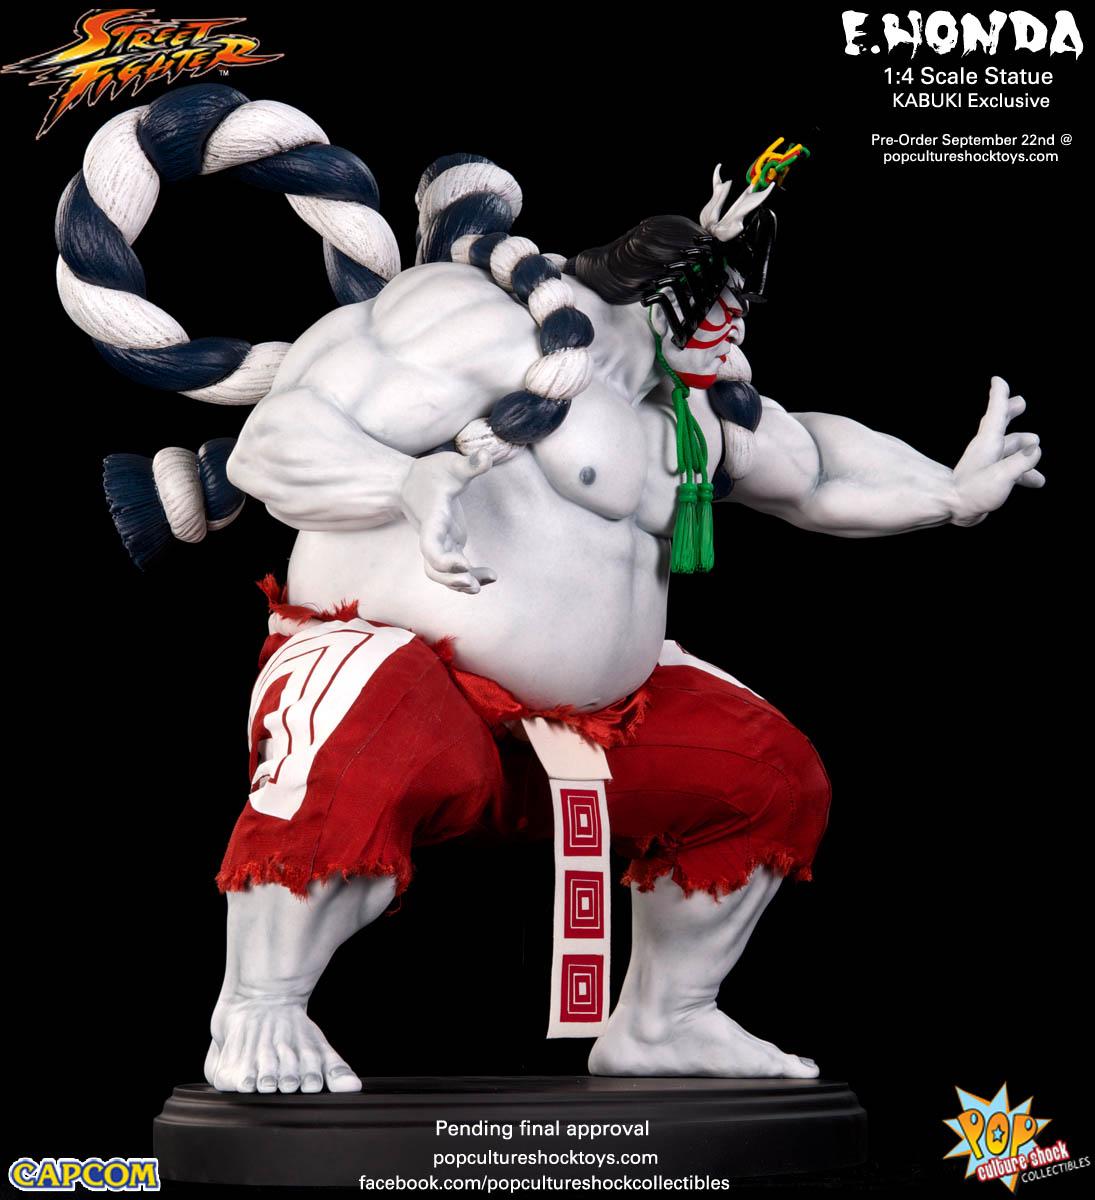 [Pop Culture Shock] Street Fighter: E. Honda 1/4 Statue - Página 3 Street-Fighter-E.-Honda-Kabuki-Statue-006